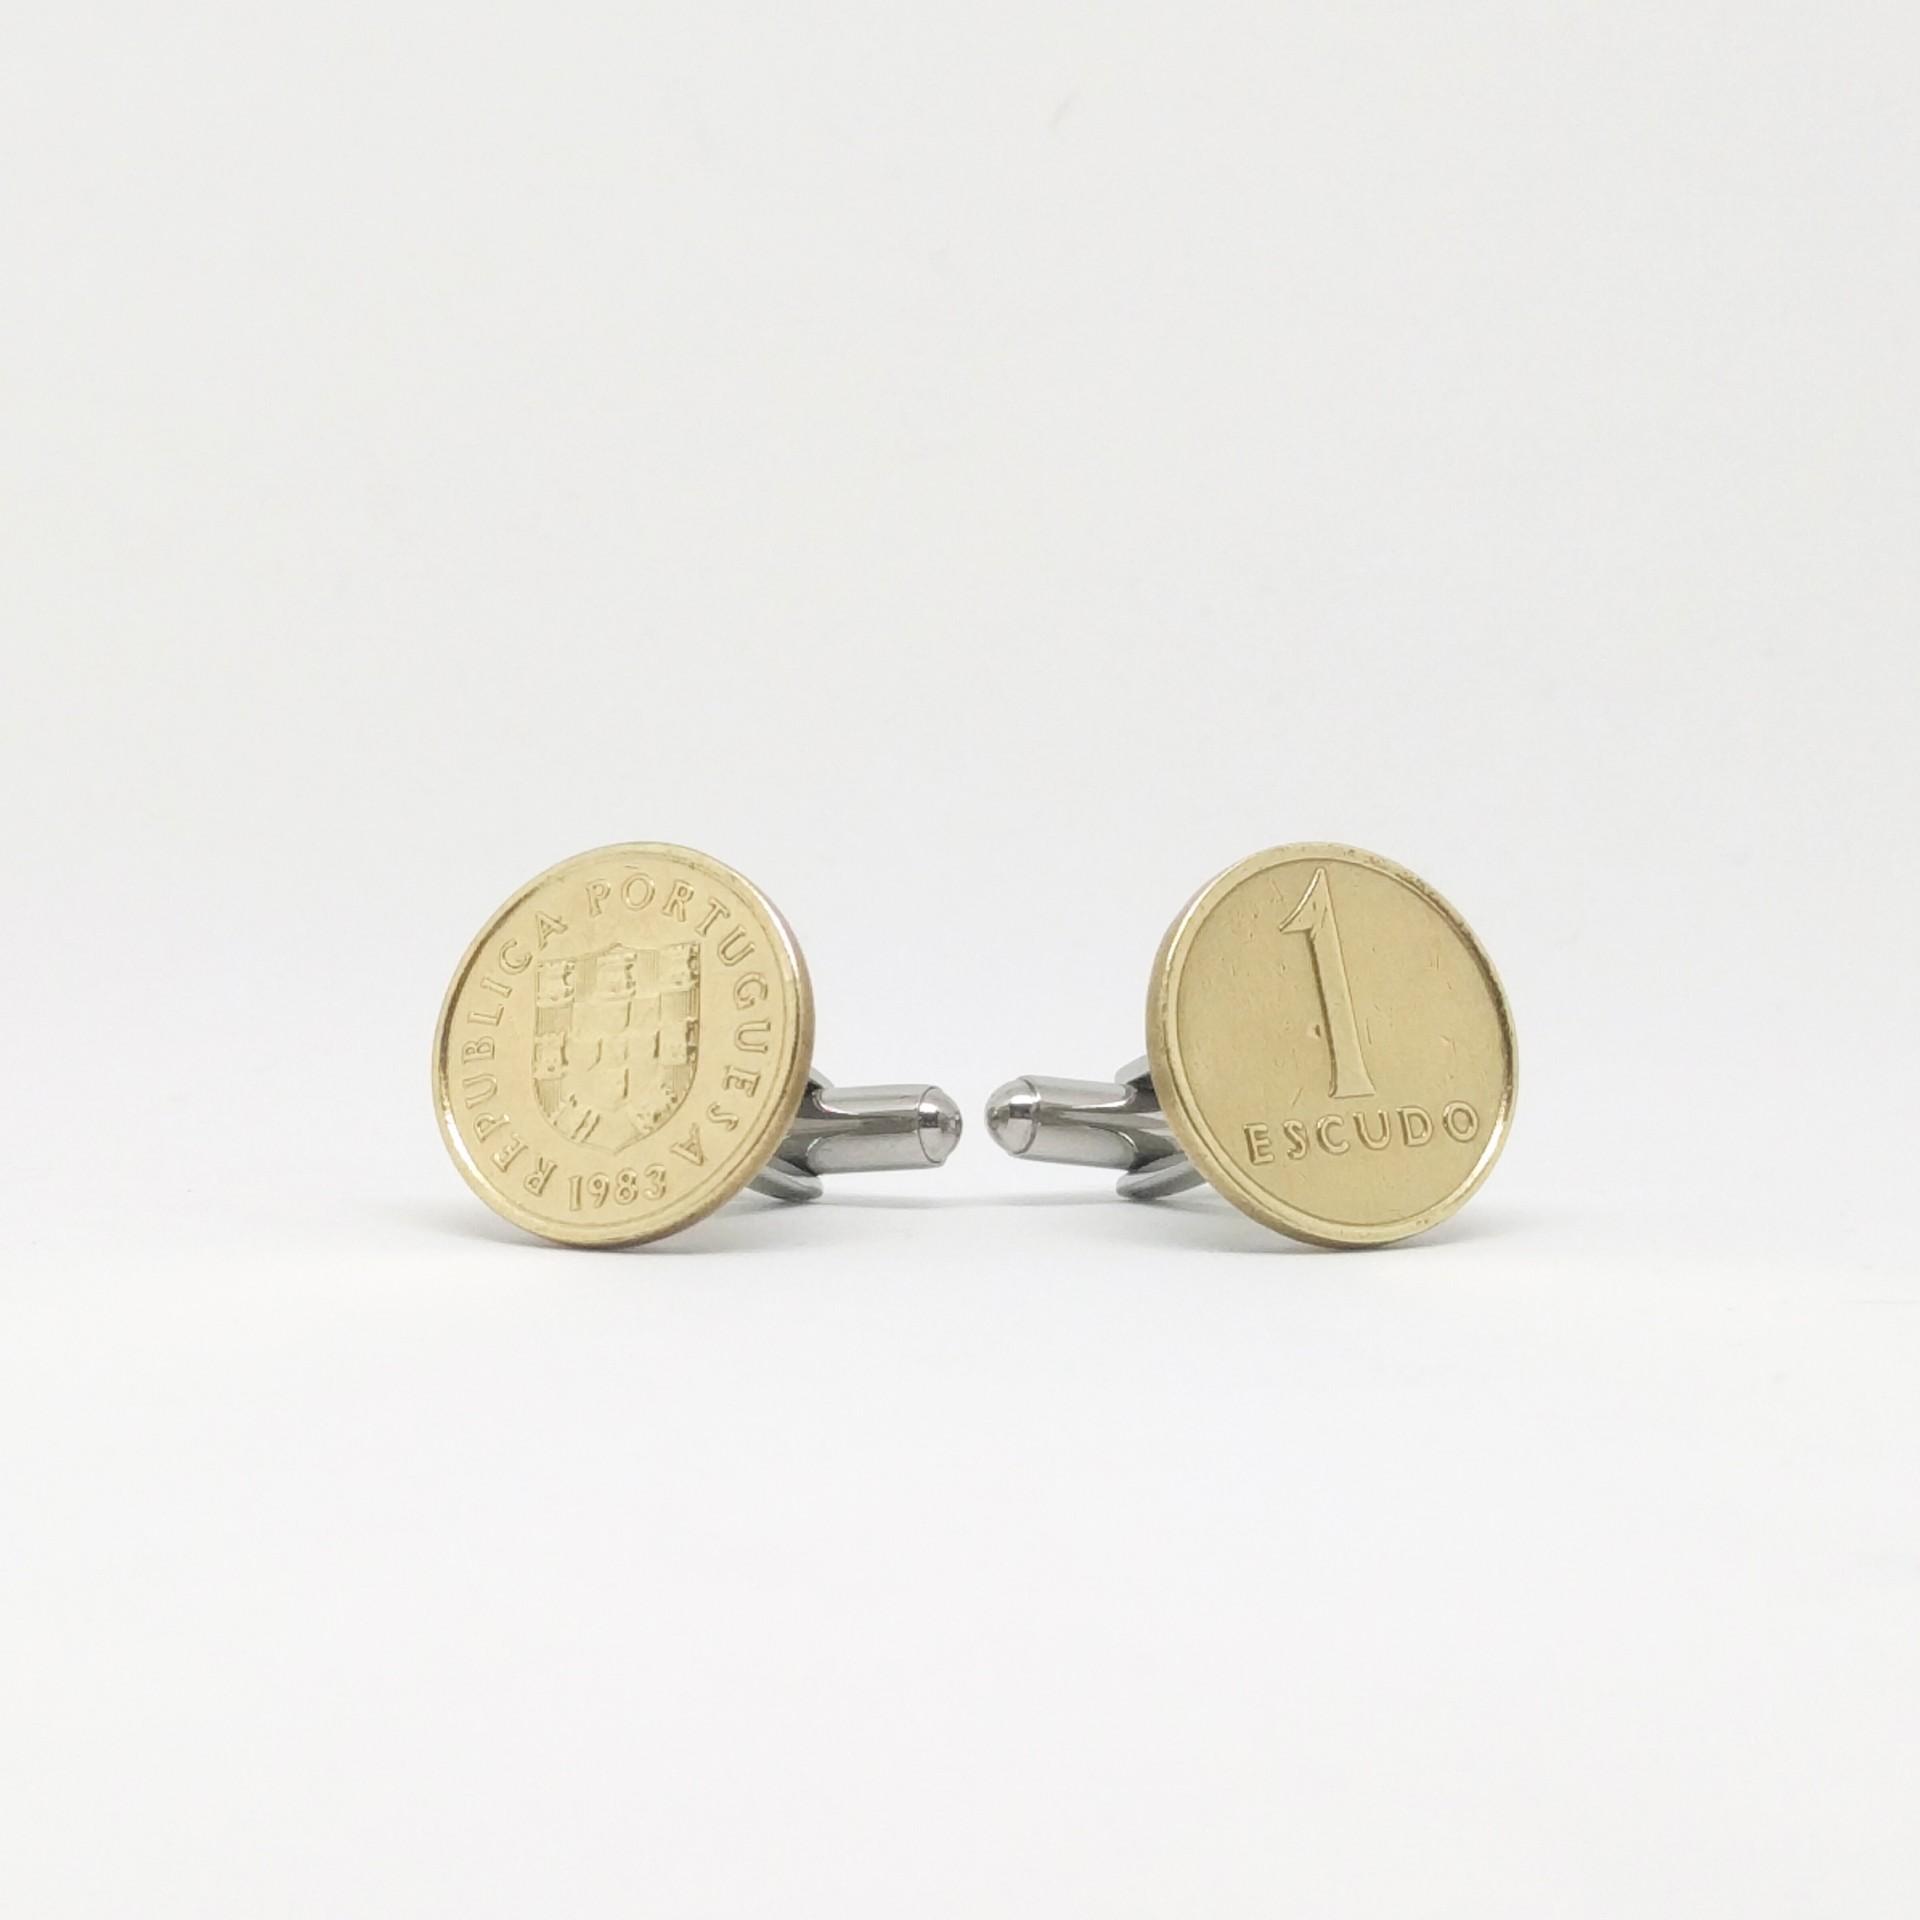 1$ Escudo